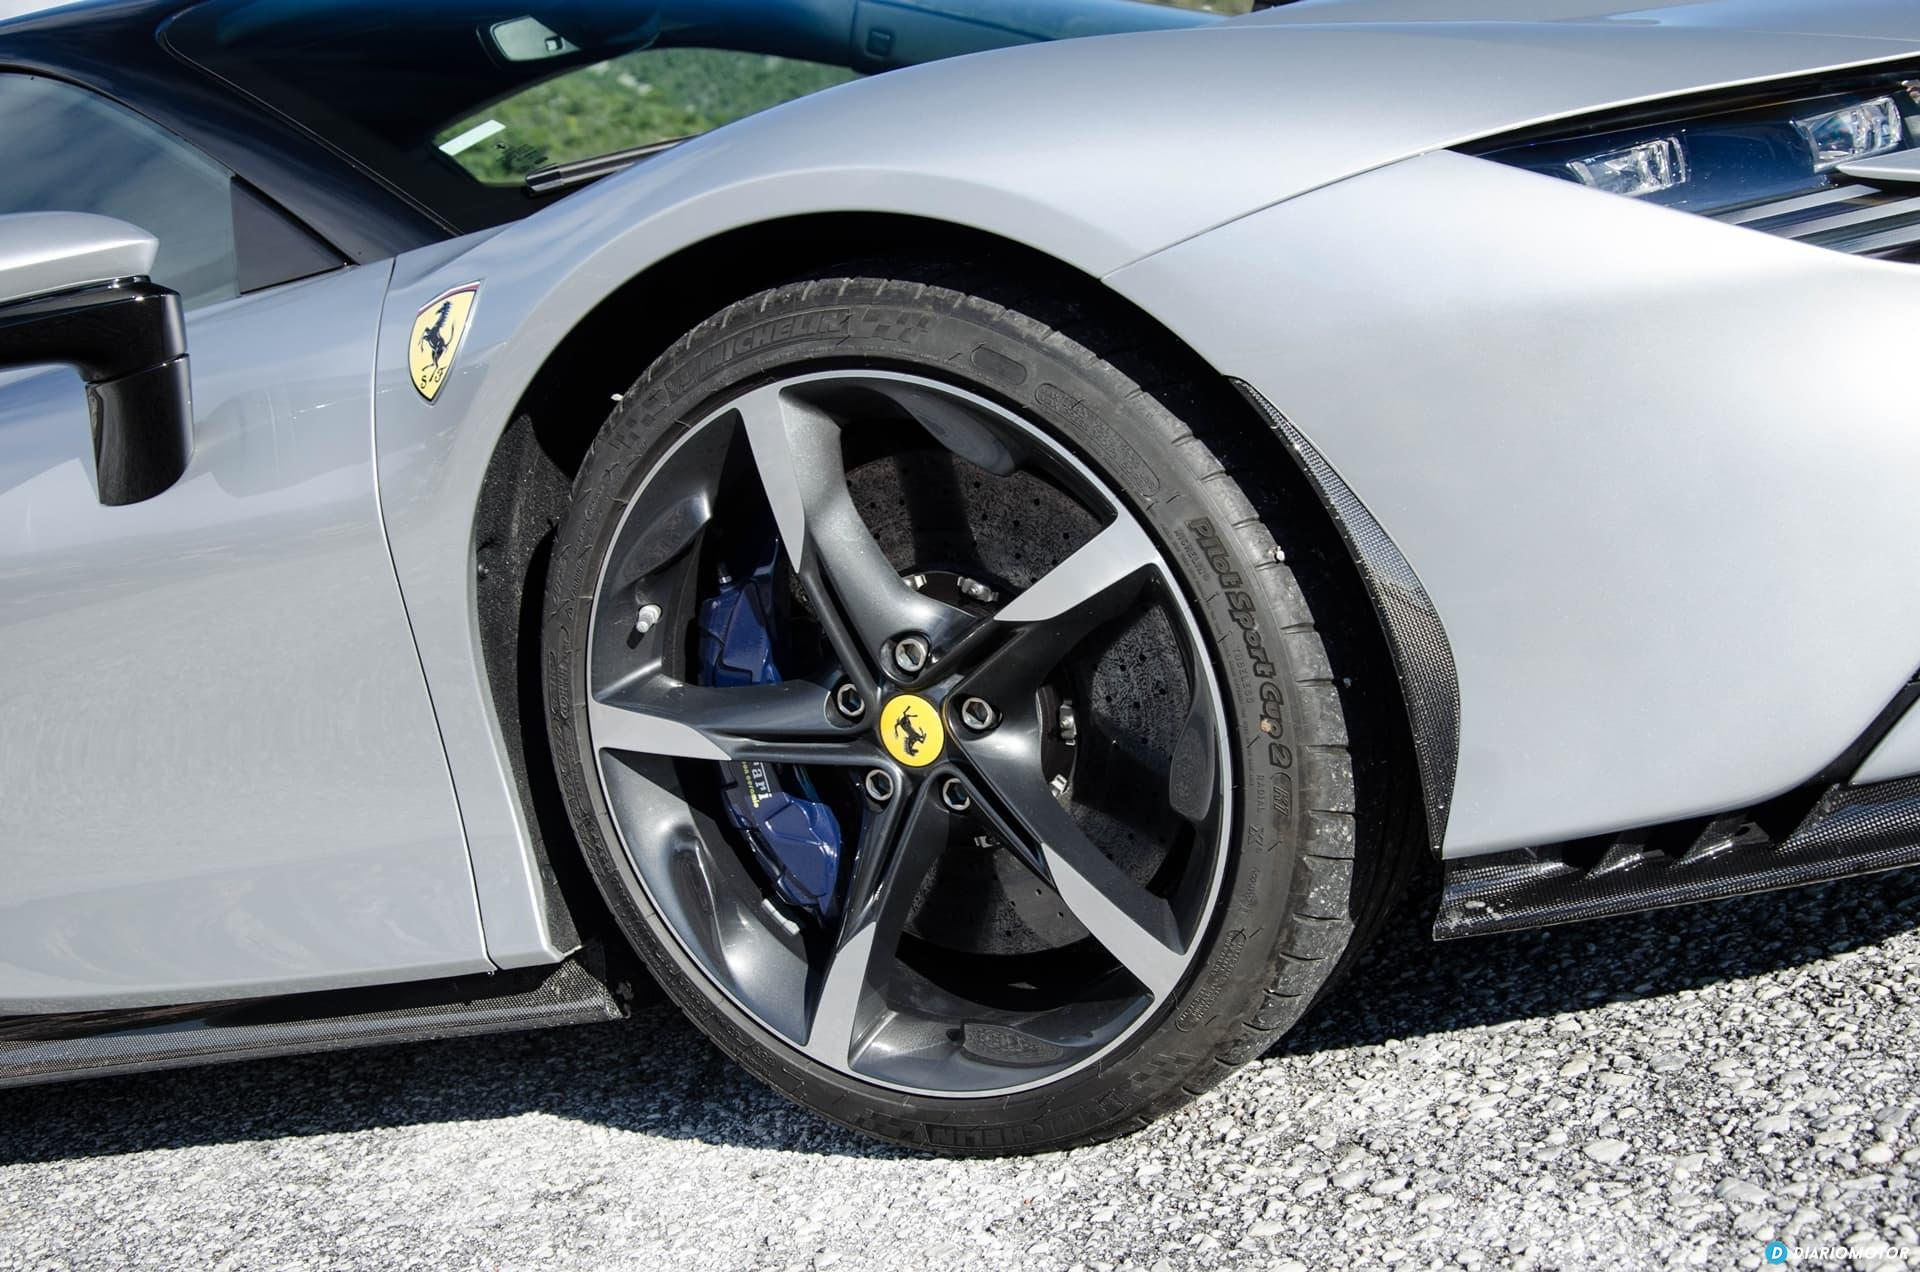 Ferrari Sf90 Stradale Prueba Dcd 1220 016